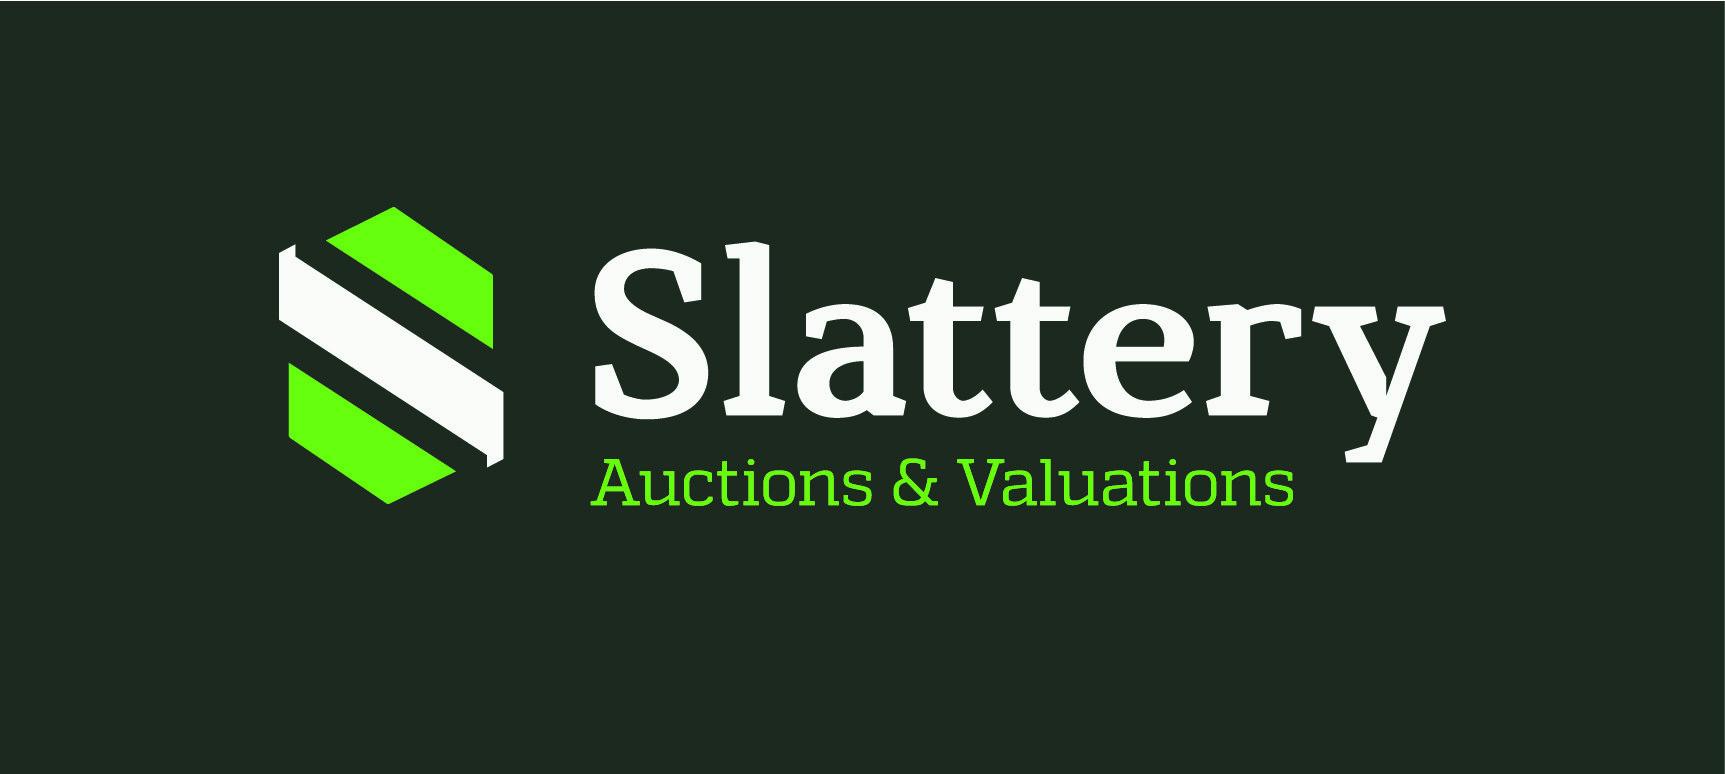 Slattery Auction